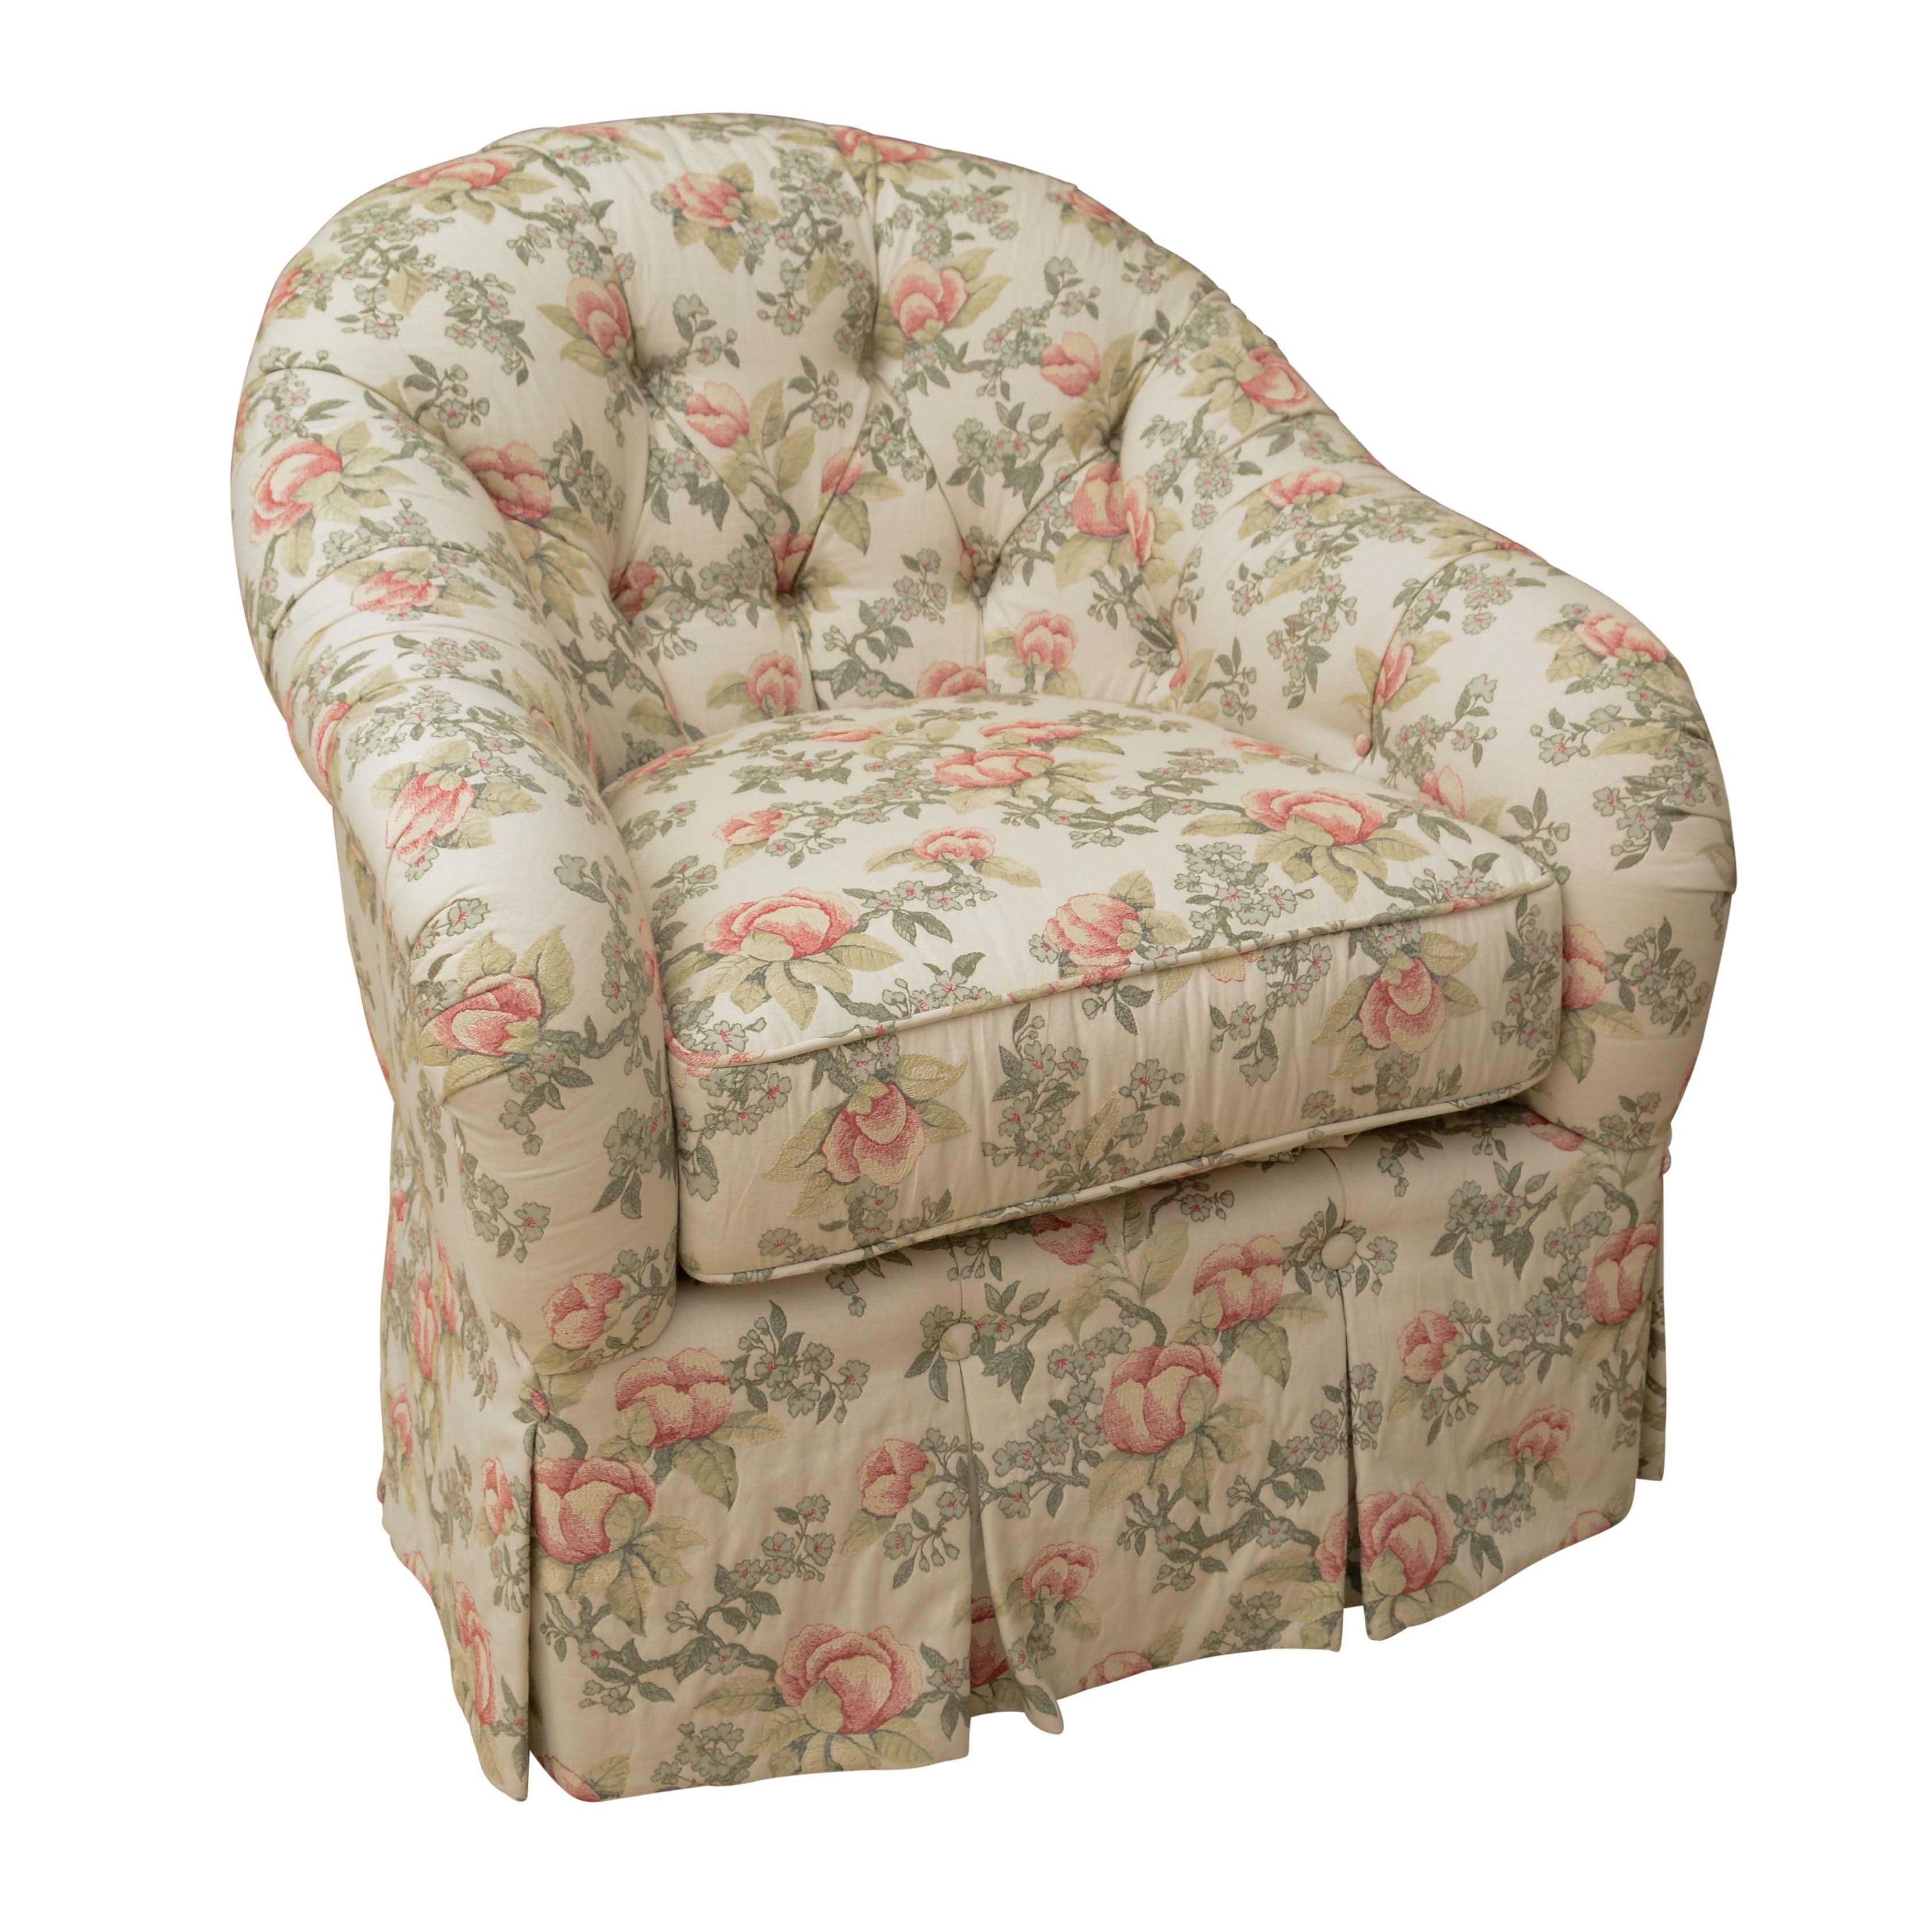 Upholstered Club Chair by Kravet